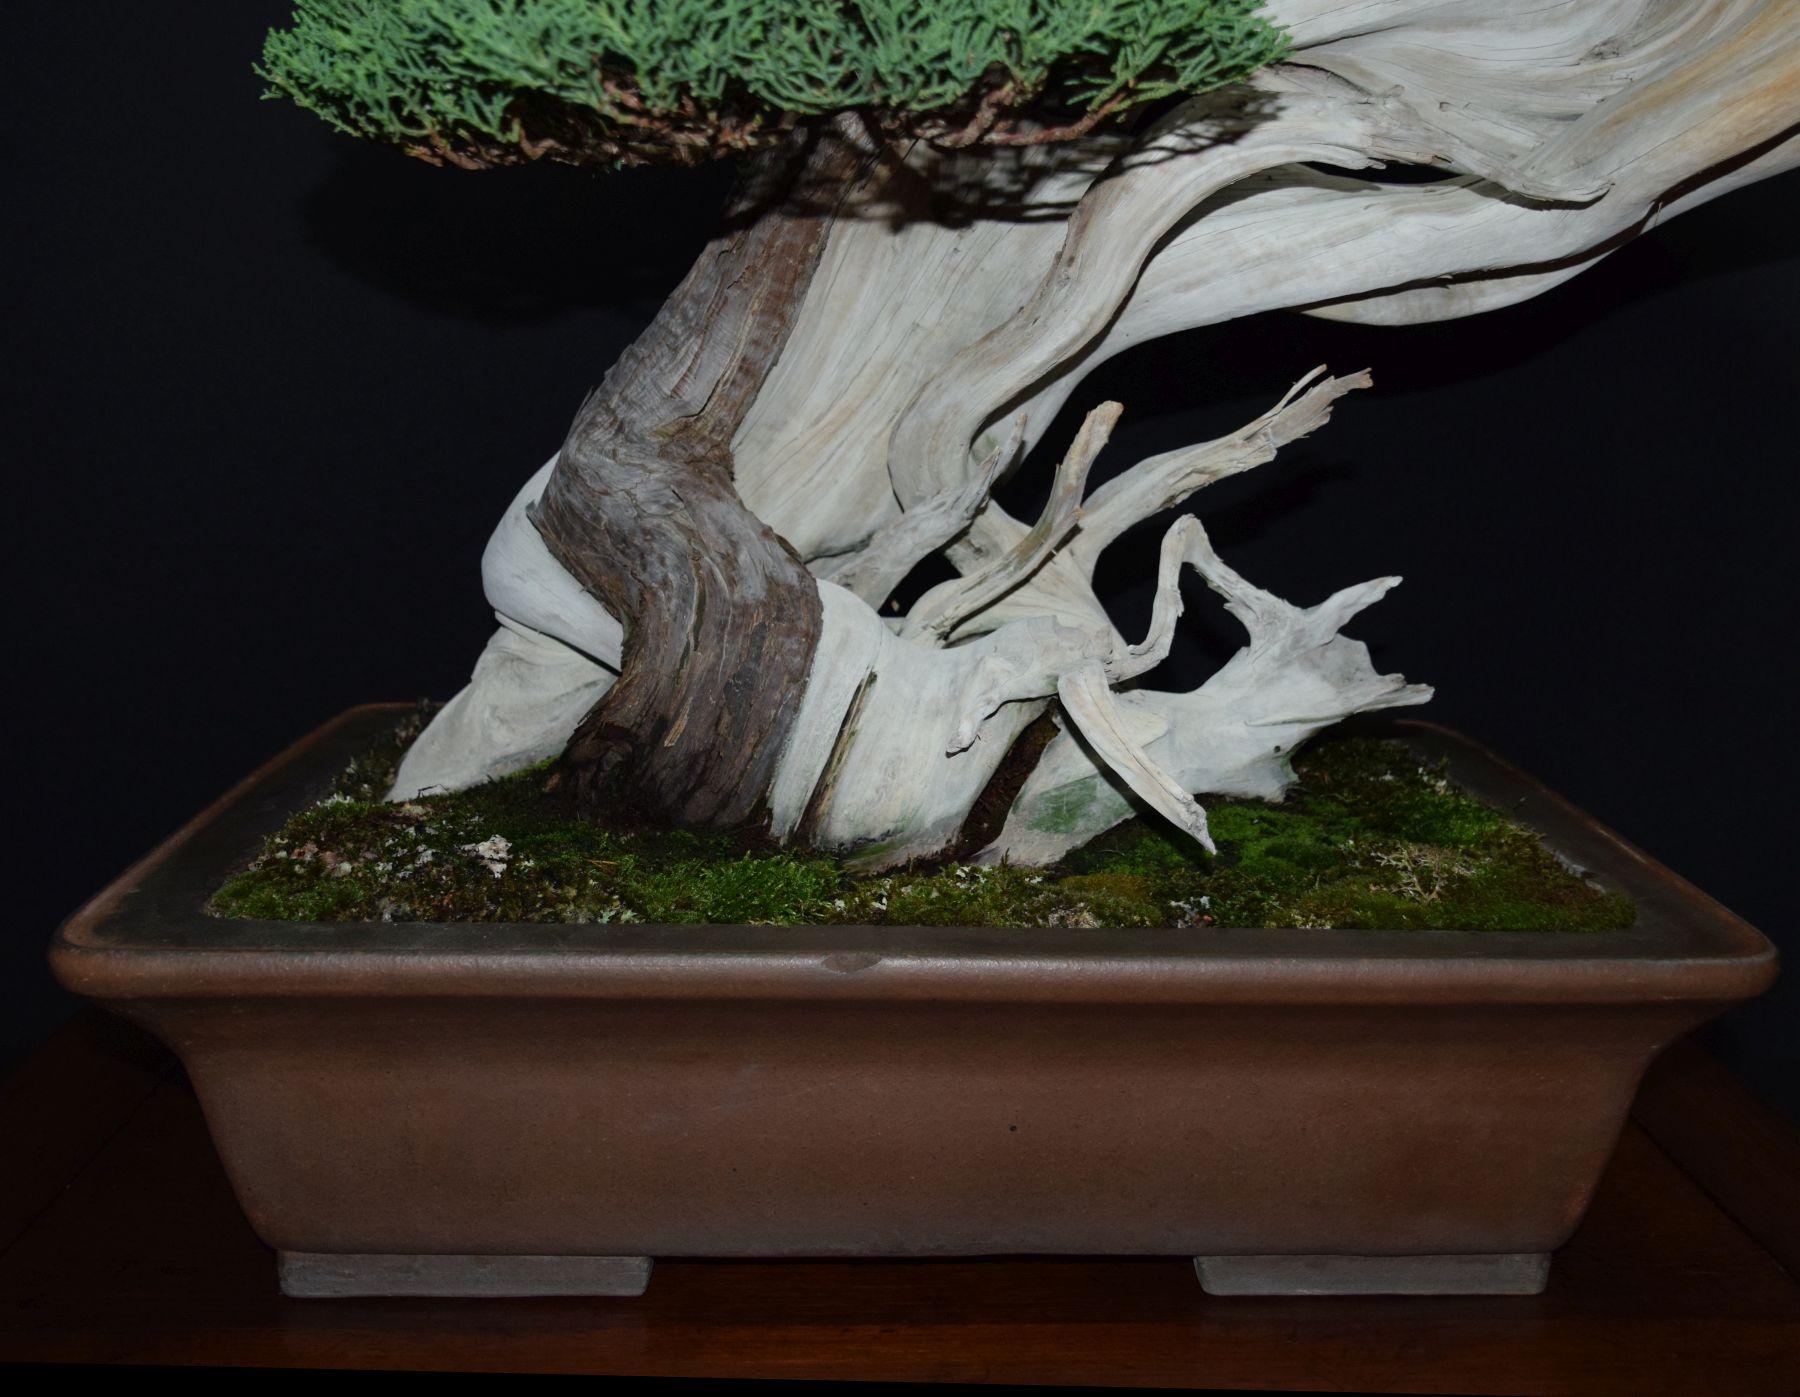 bonsai-museum-luis-vallejo-032